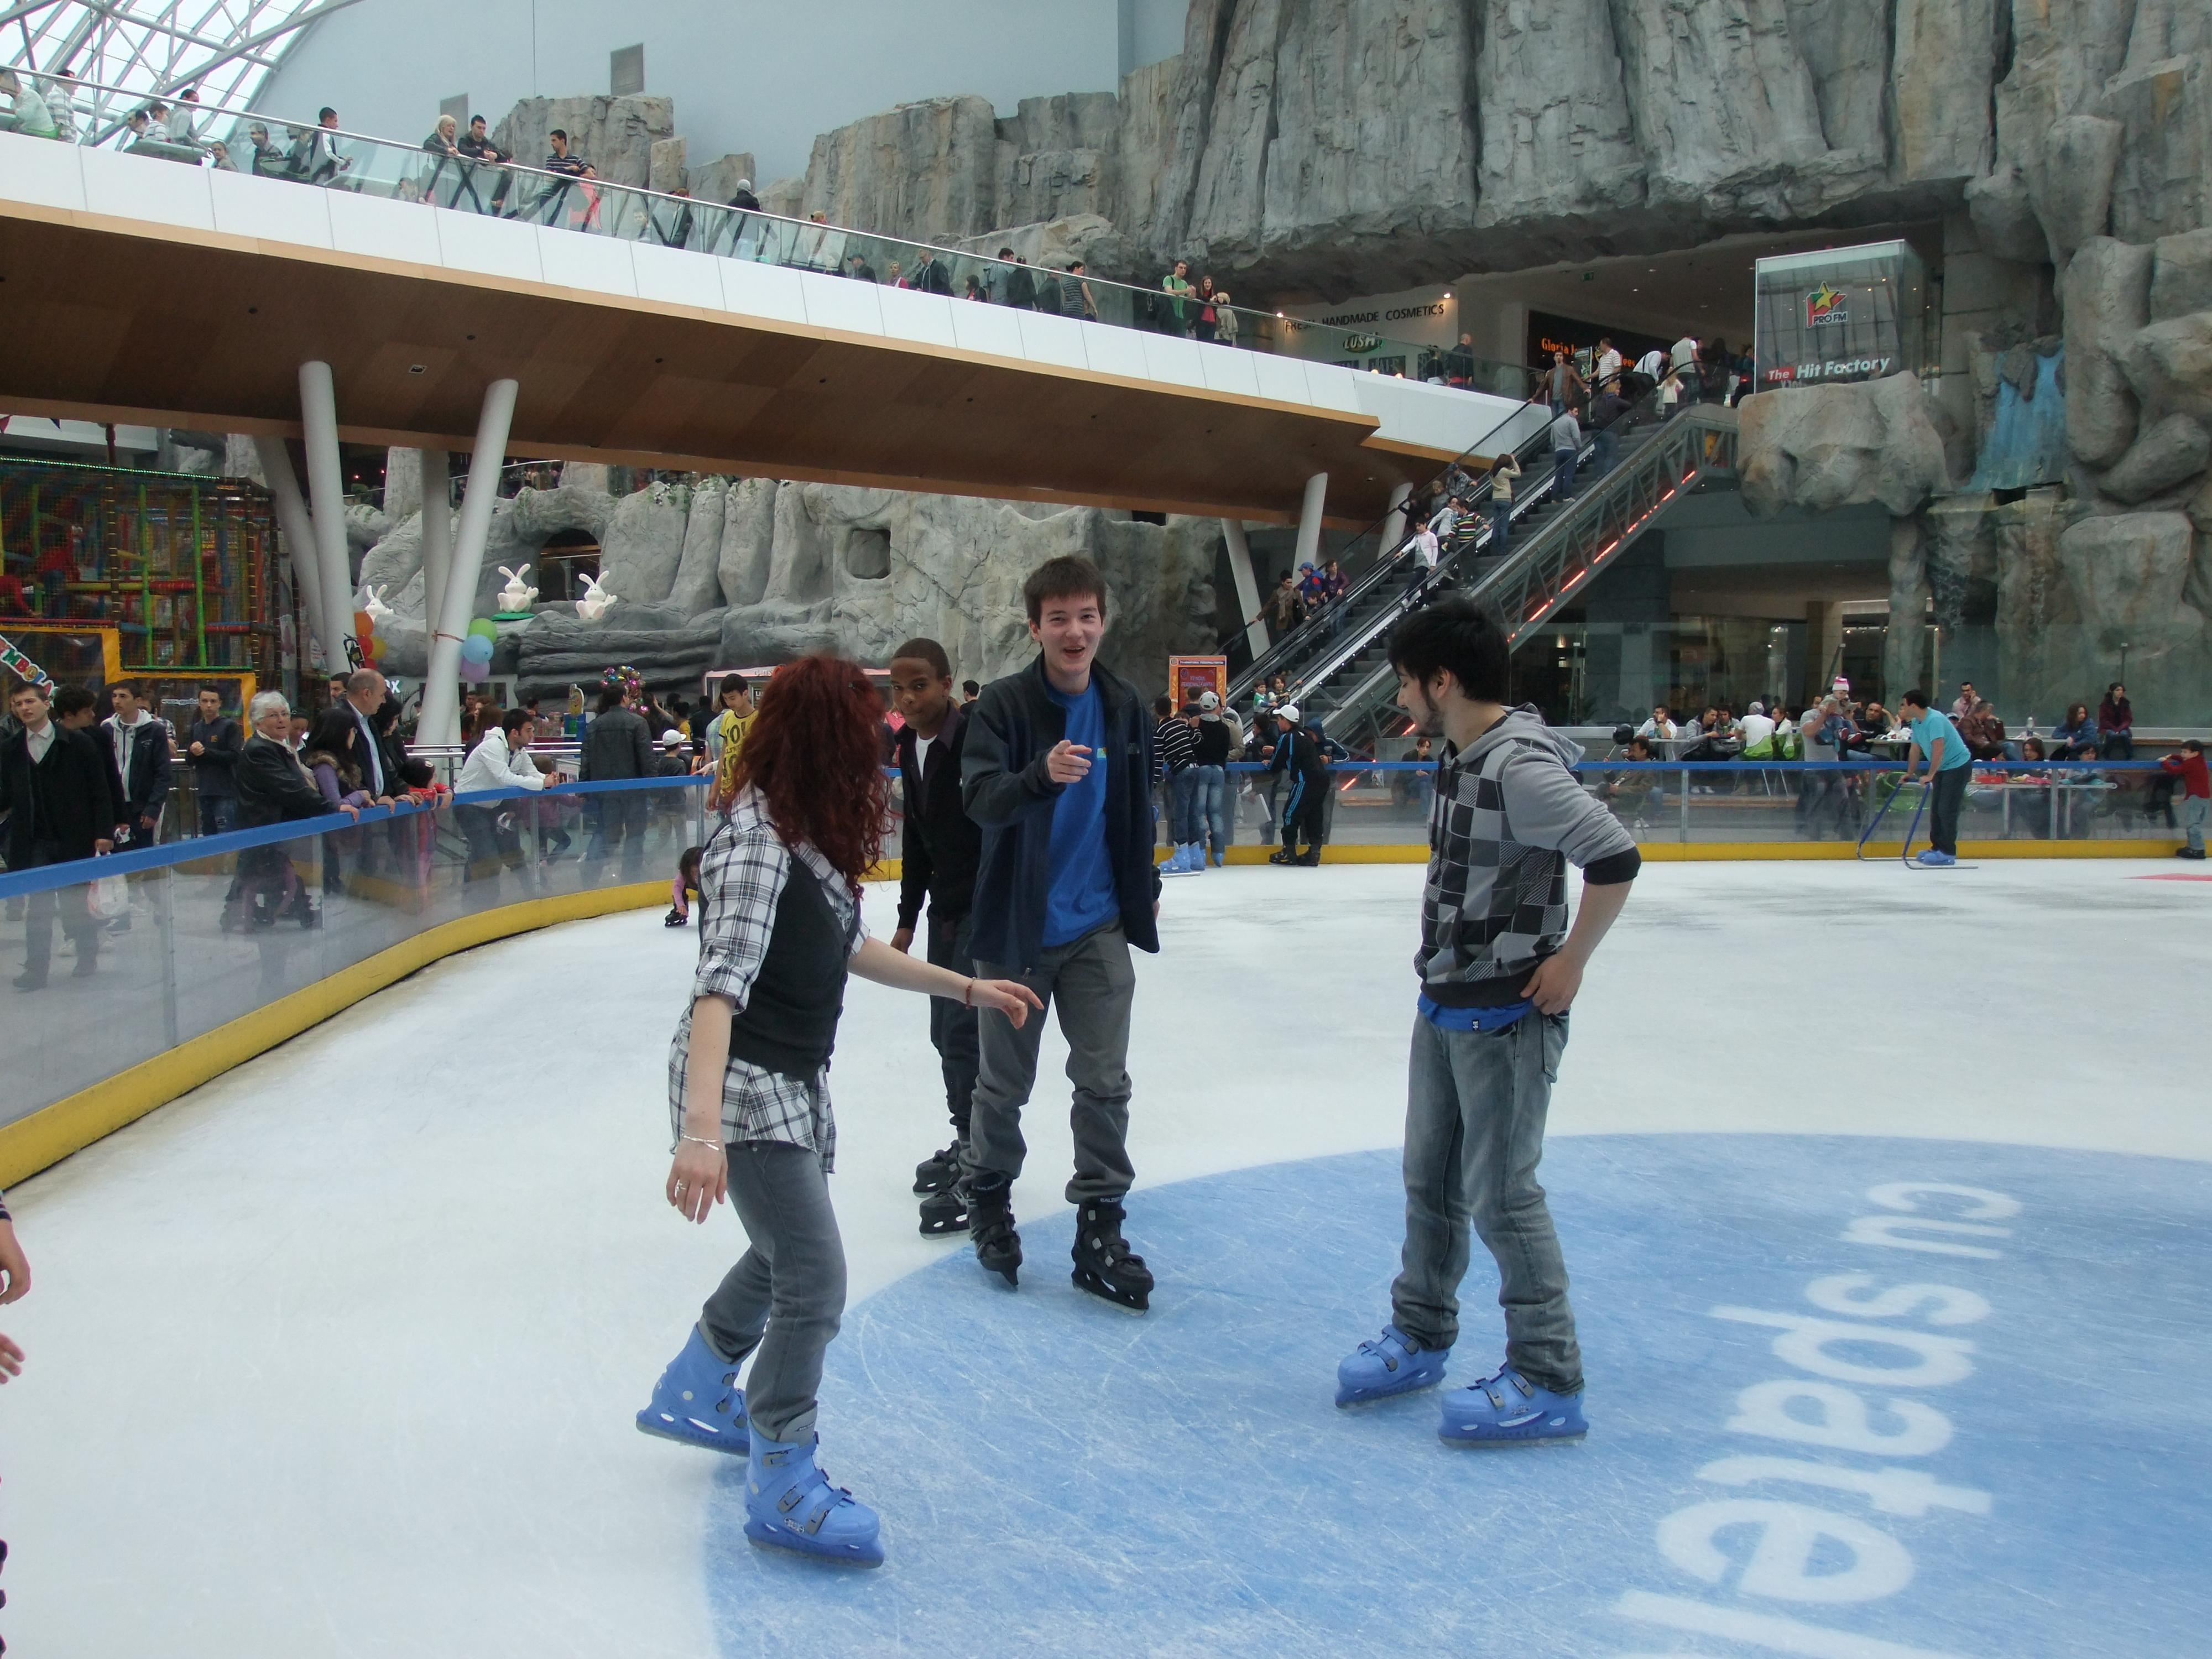 Me ice skating